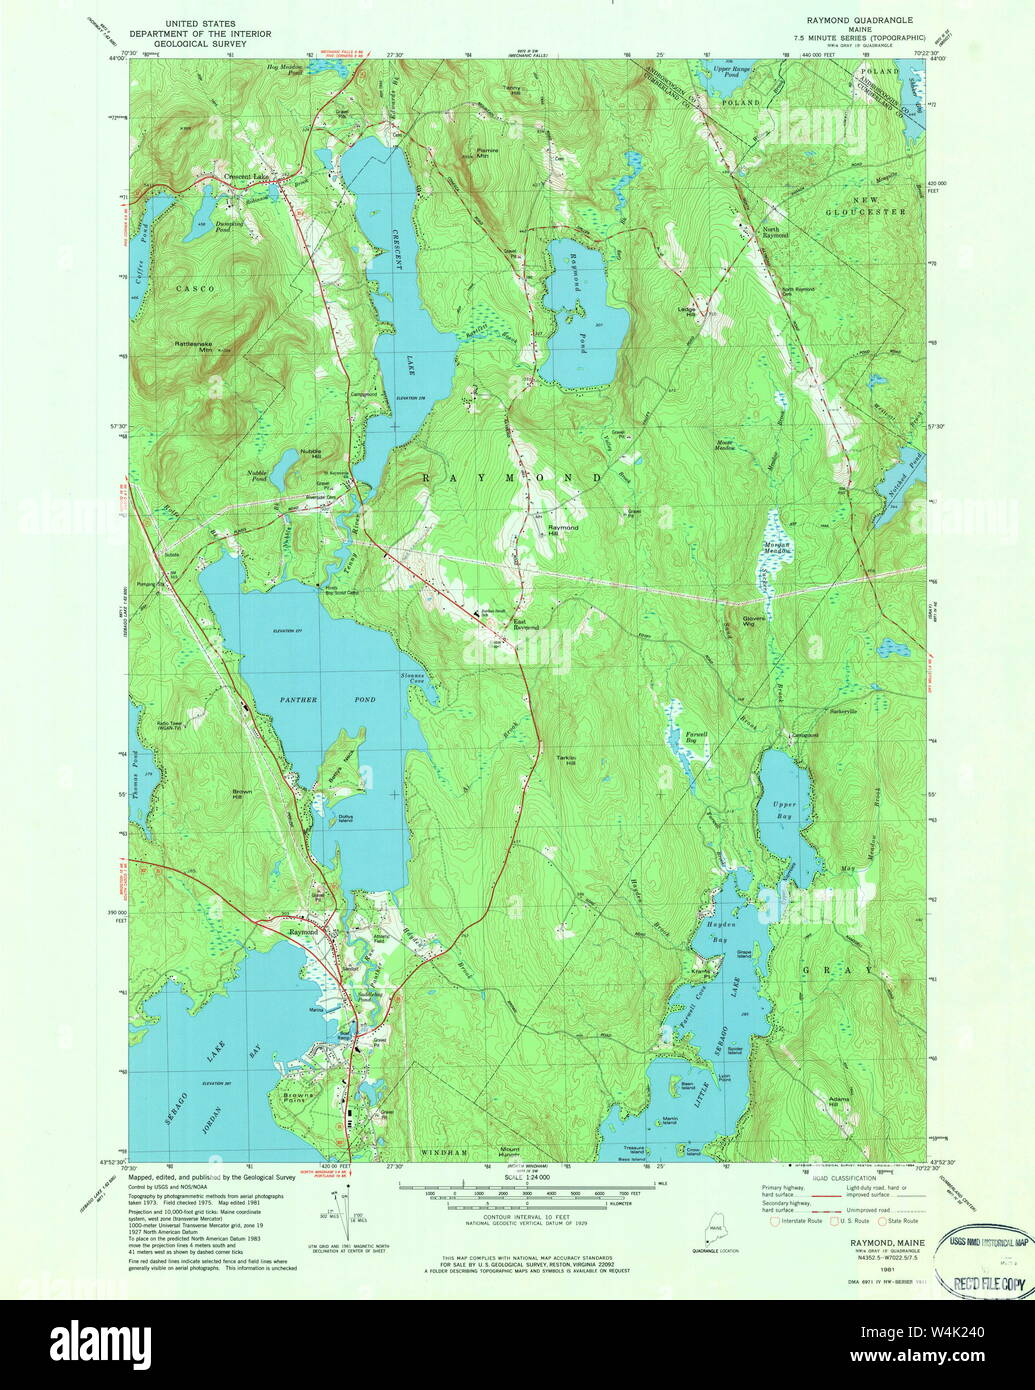 map of raymond maine Maine Usgs Historical Map Raymond 807088 1981 24000 Restoration map of raymond maine